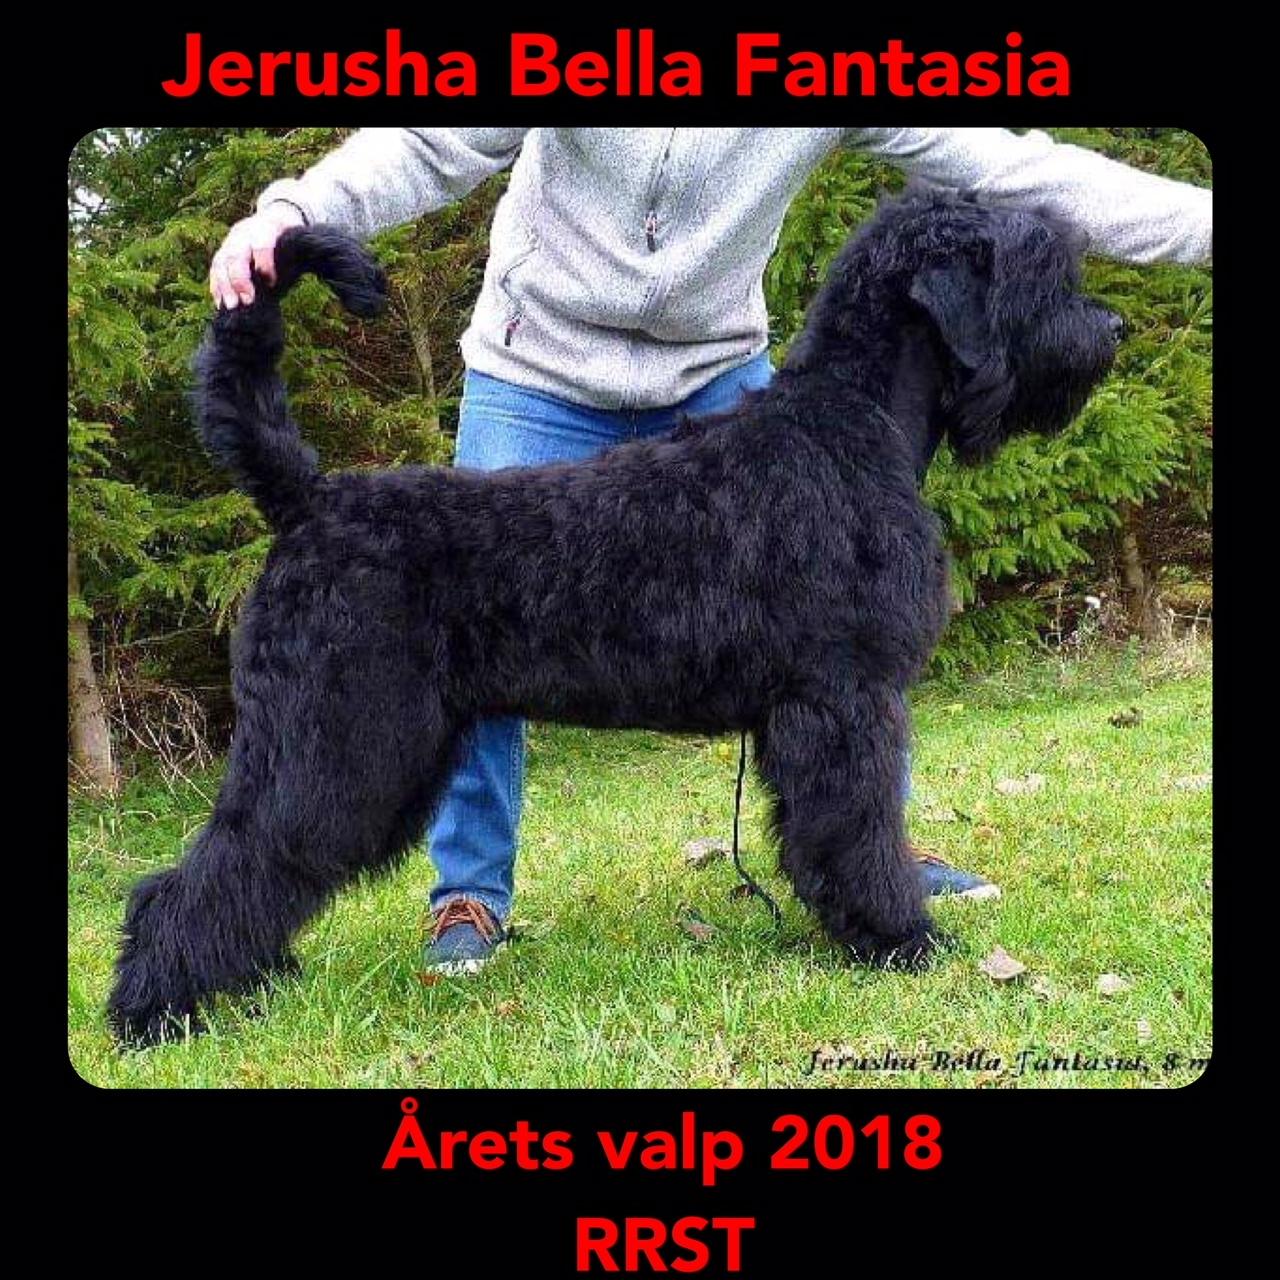 Arets Valp 2018